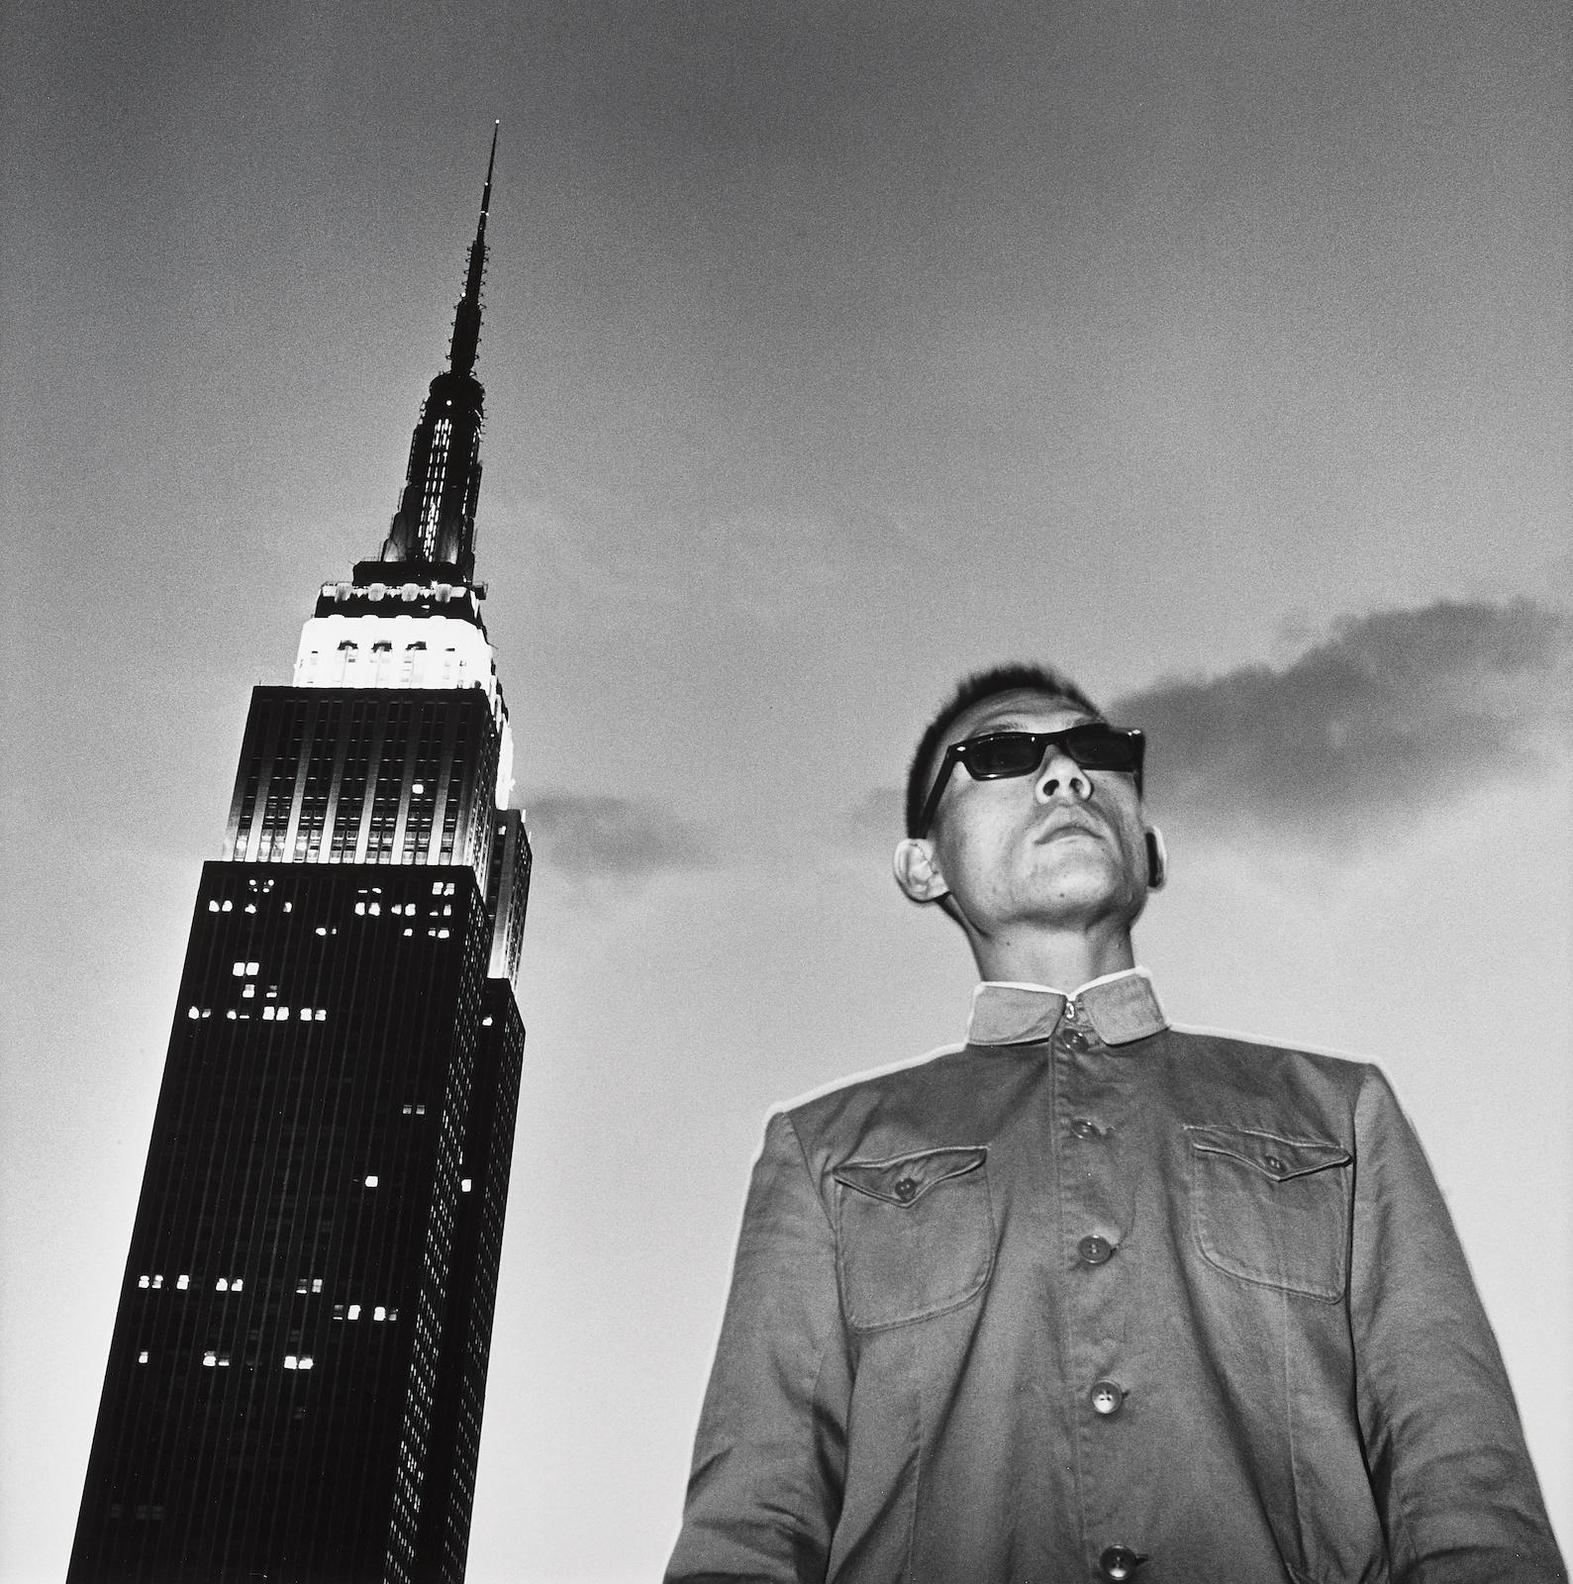 Tseng Kwong Chi-Empire State Building, New York-1979